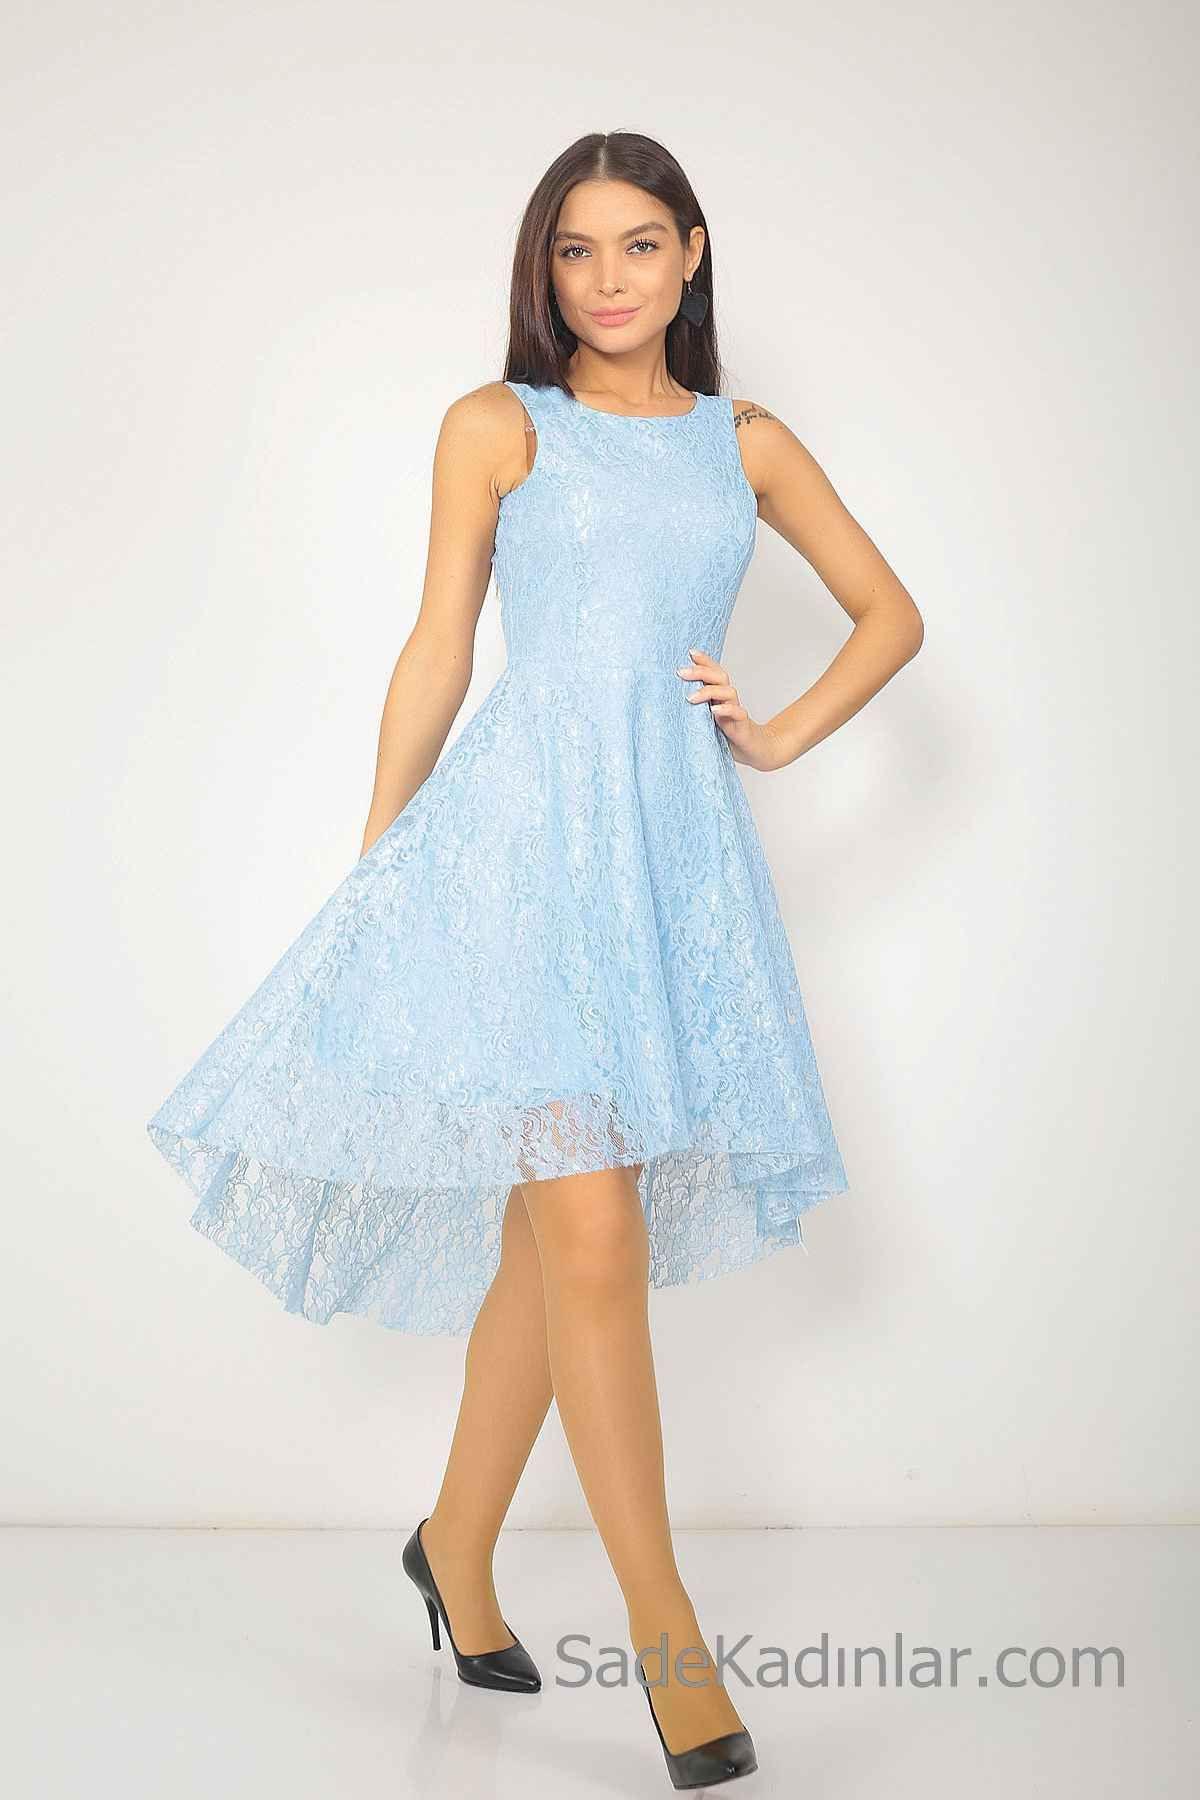 2020 Bebe Mavisi Elbise Modelleri Onu Kisa Arkasi Uzun Kolsuz Dantel Elbise Modelleri Elbise Kiyafet